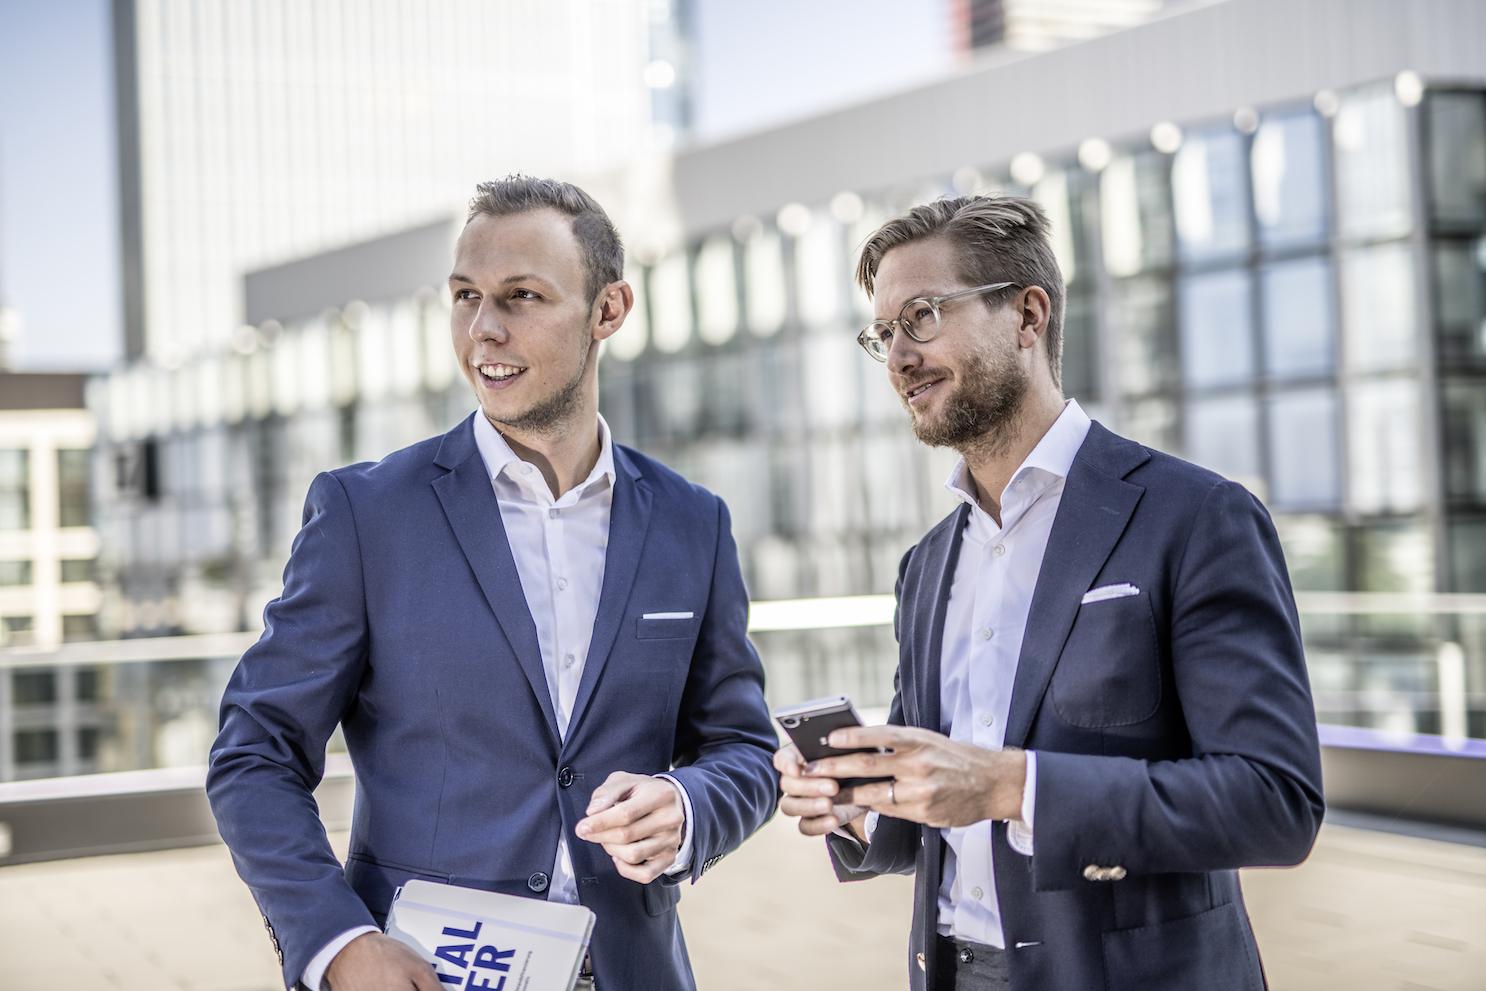 3 Fragen an Stefan Hnida - Leiter Partnermanagement creditshelf AG